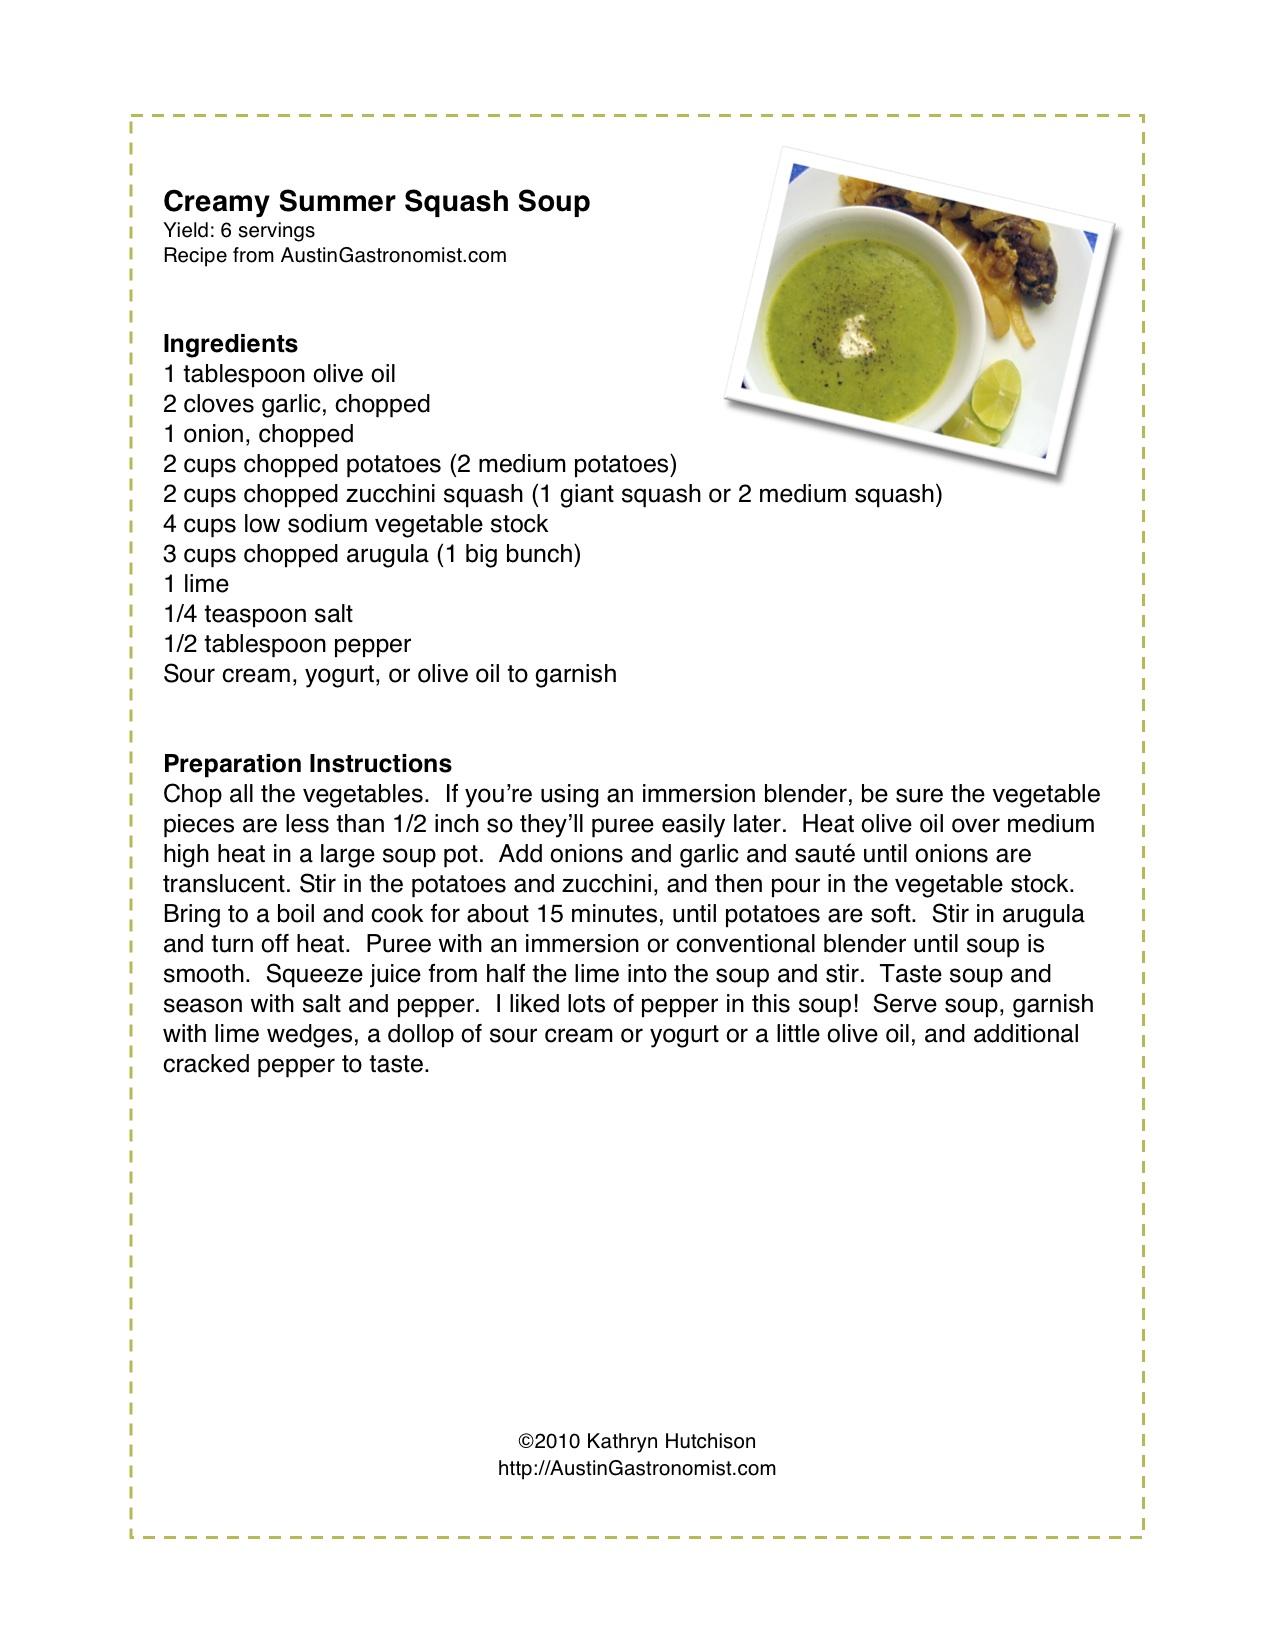 Top 10 of 2010, Plus Printable Recipes! | The Austin Gastronomist